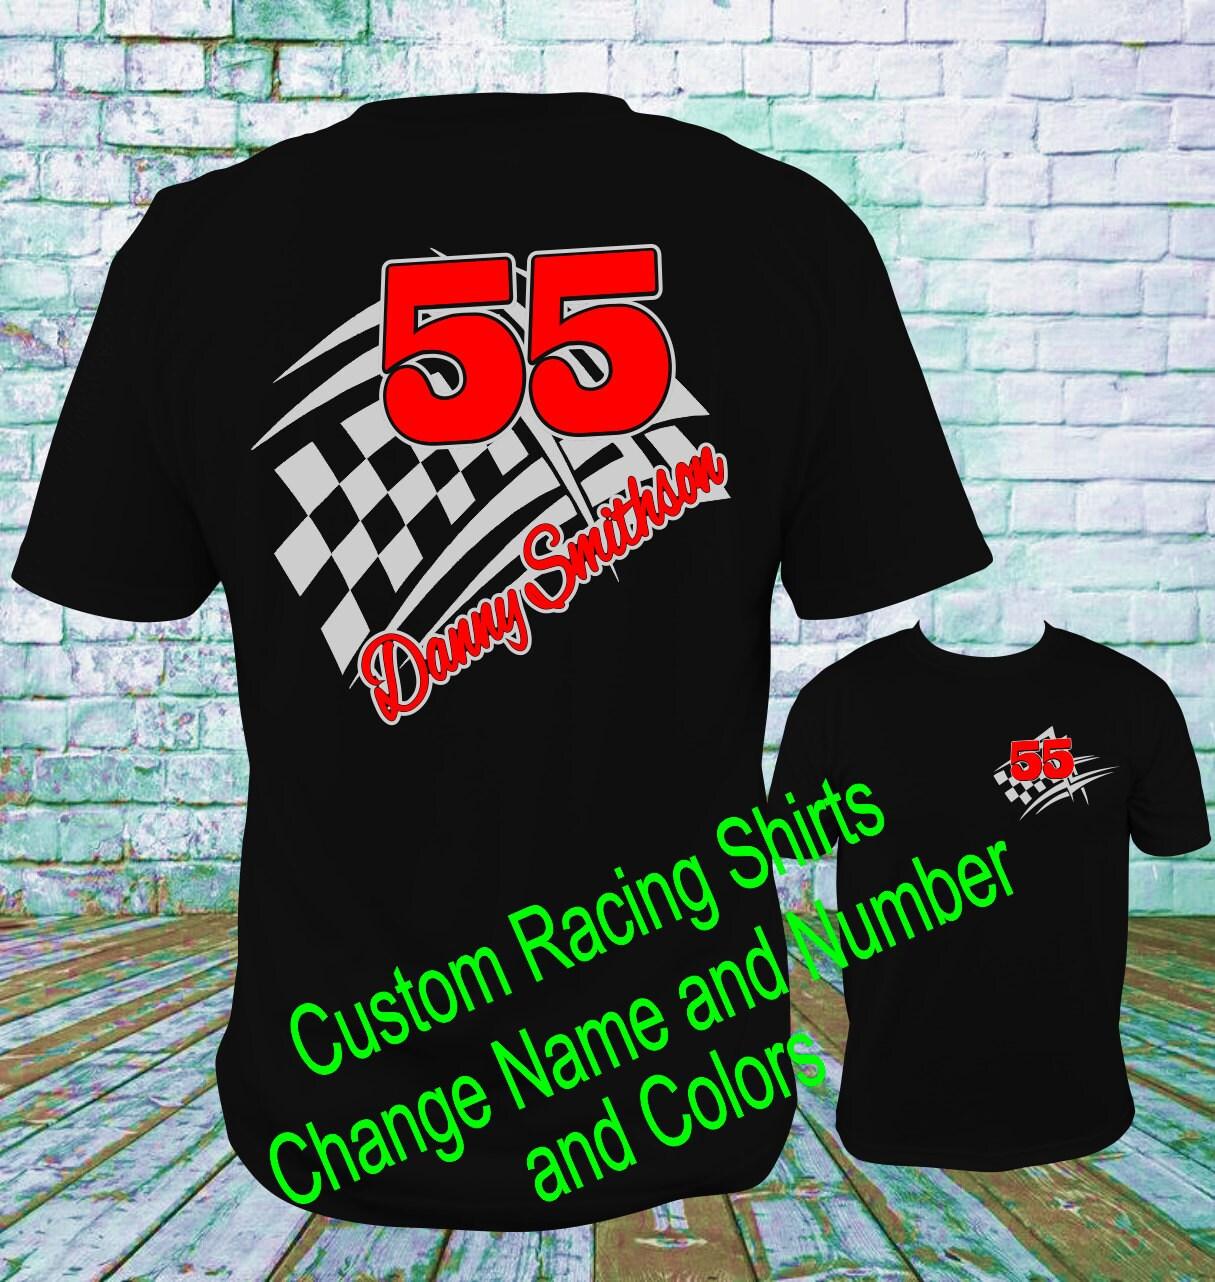 Custom Personalized Racing Shirts Design 1 Dirt Track Racing Etsy